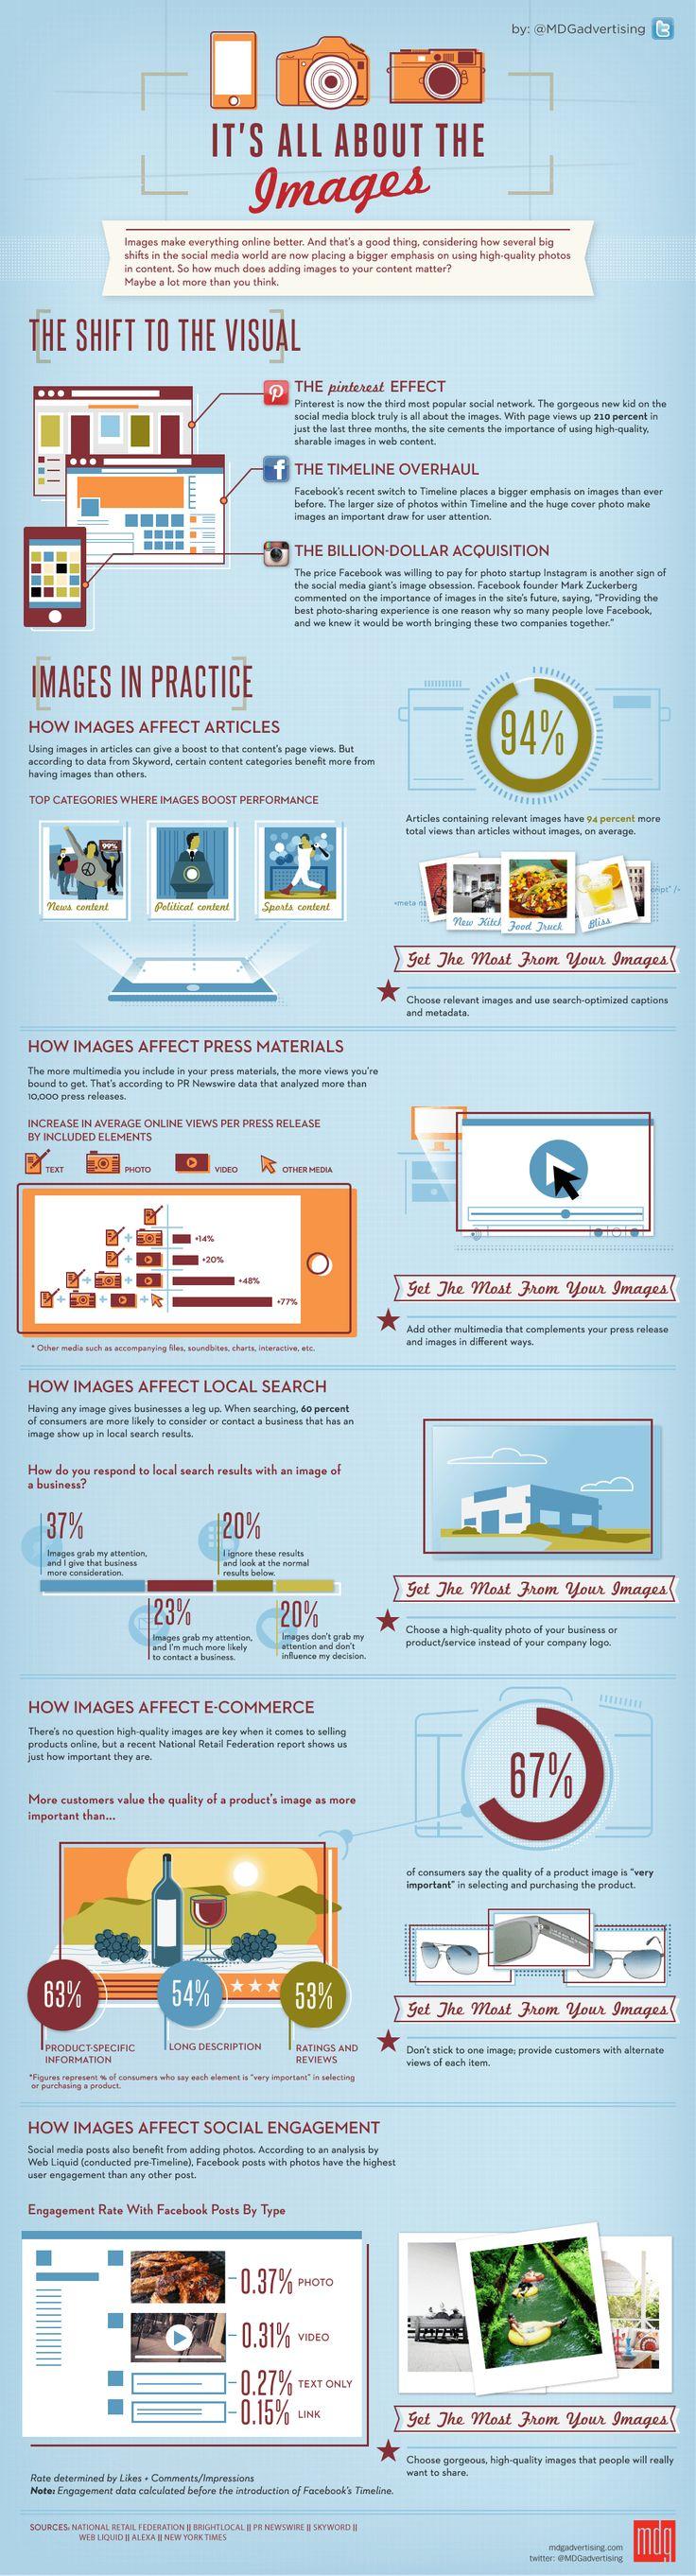 Visual Marketing Infographic #contentmarketing #visualmarketing #digitalmarketing